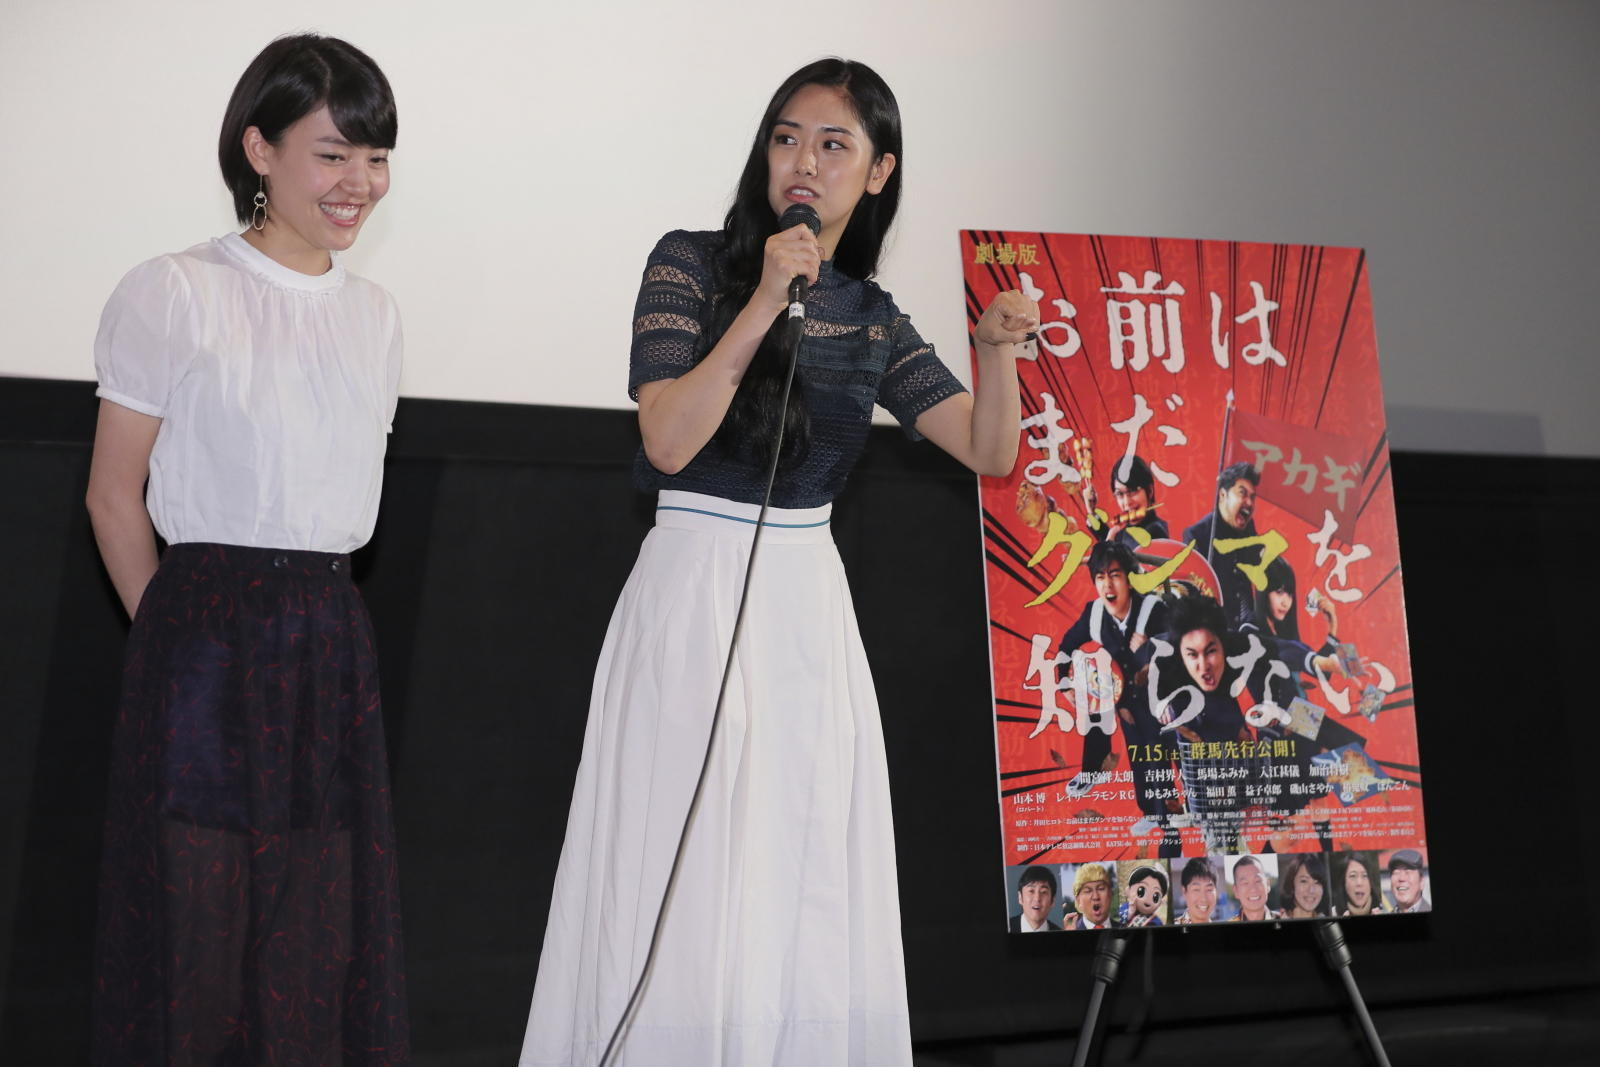 http://news.yoshimoto.co.jp/20170716174453-075cb0151dd360aaae3a3673115ad1a9257281be.jpg